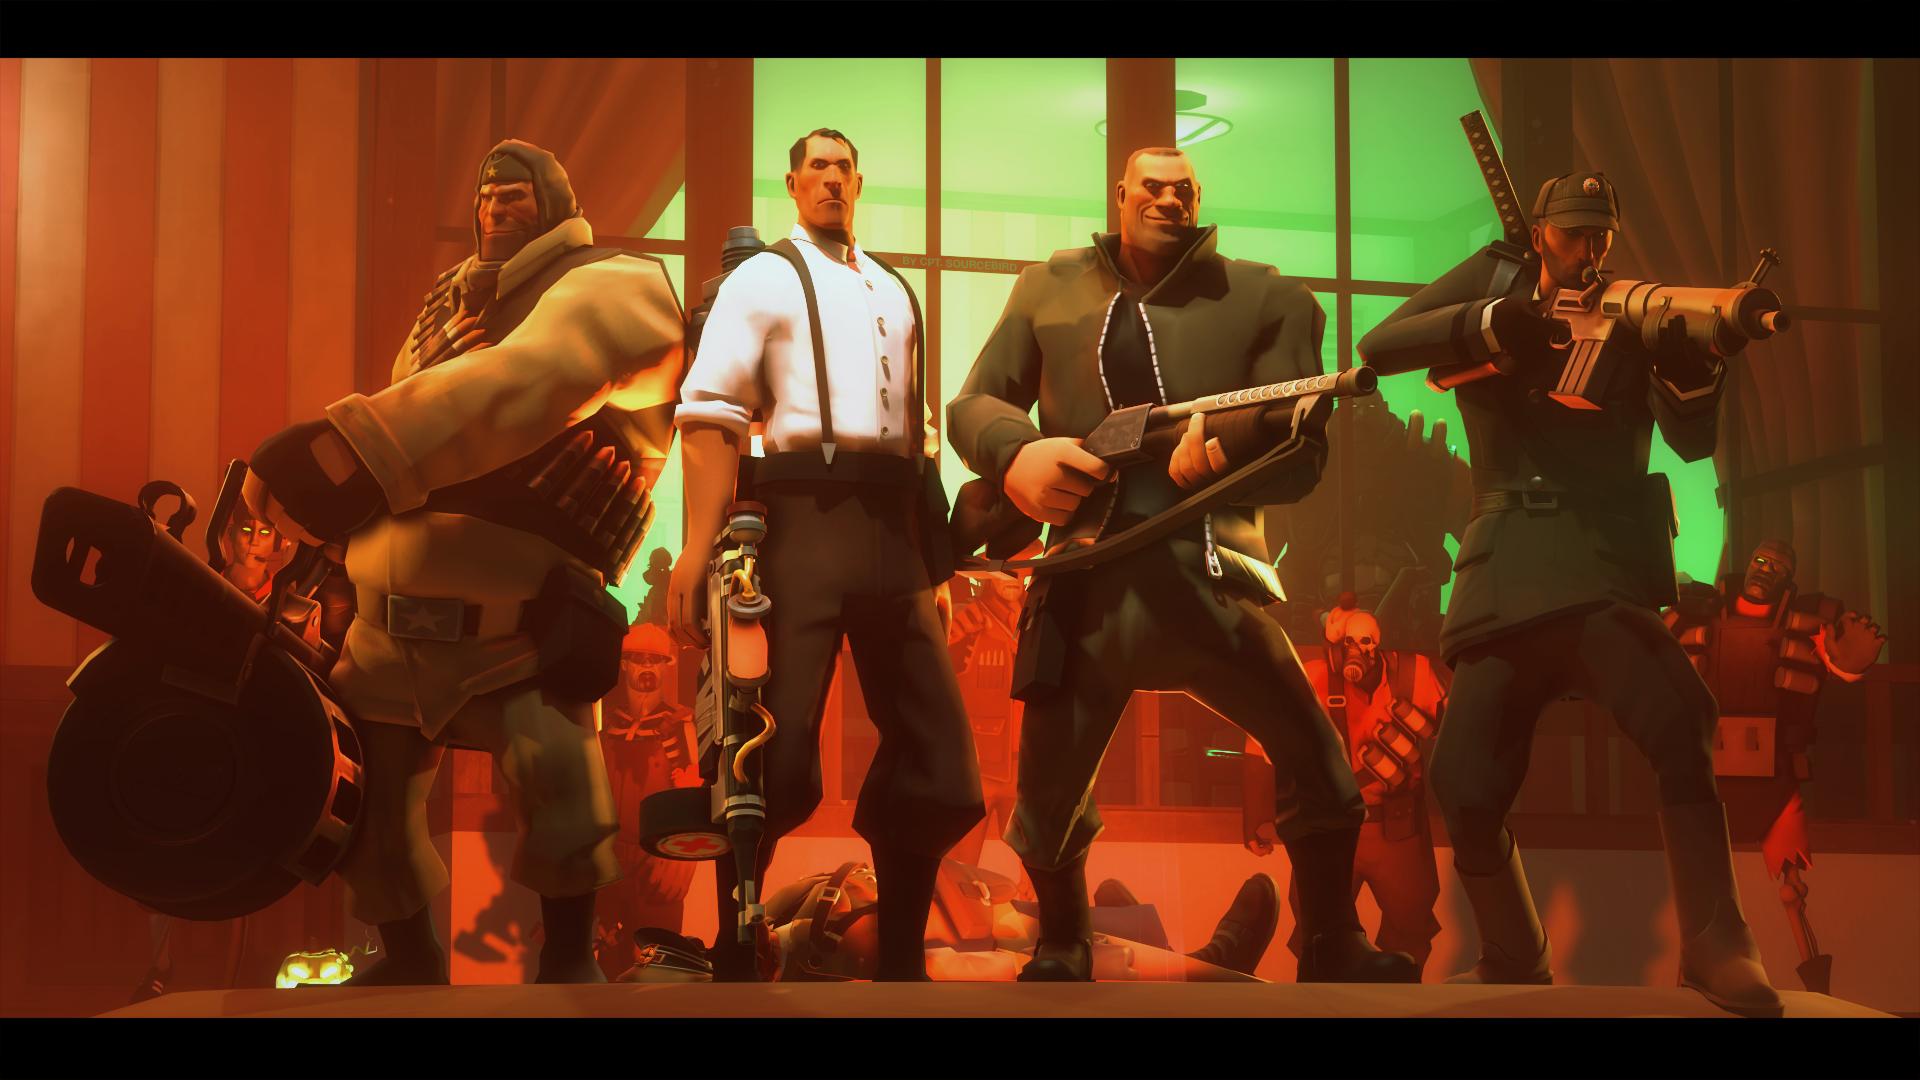 Steam Workshop Tf2 Cod Zombies Ultimus Crew Read The Description